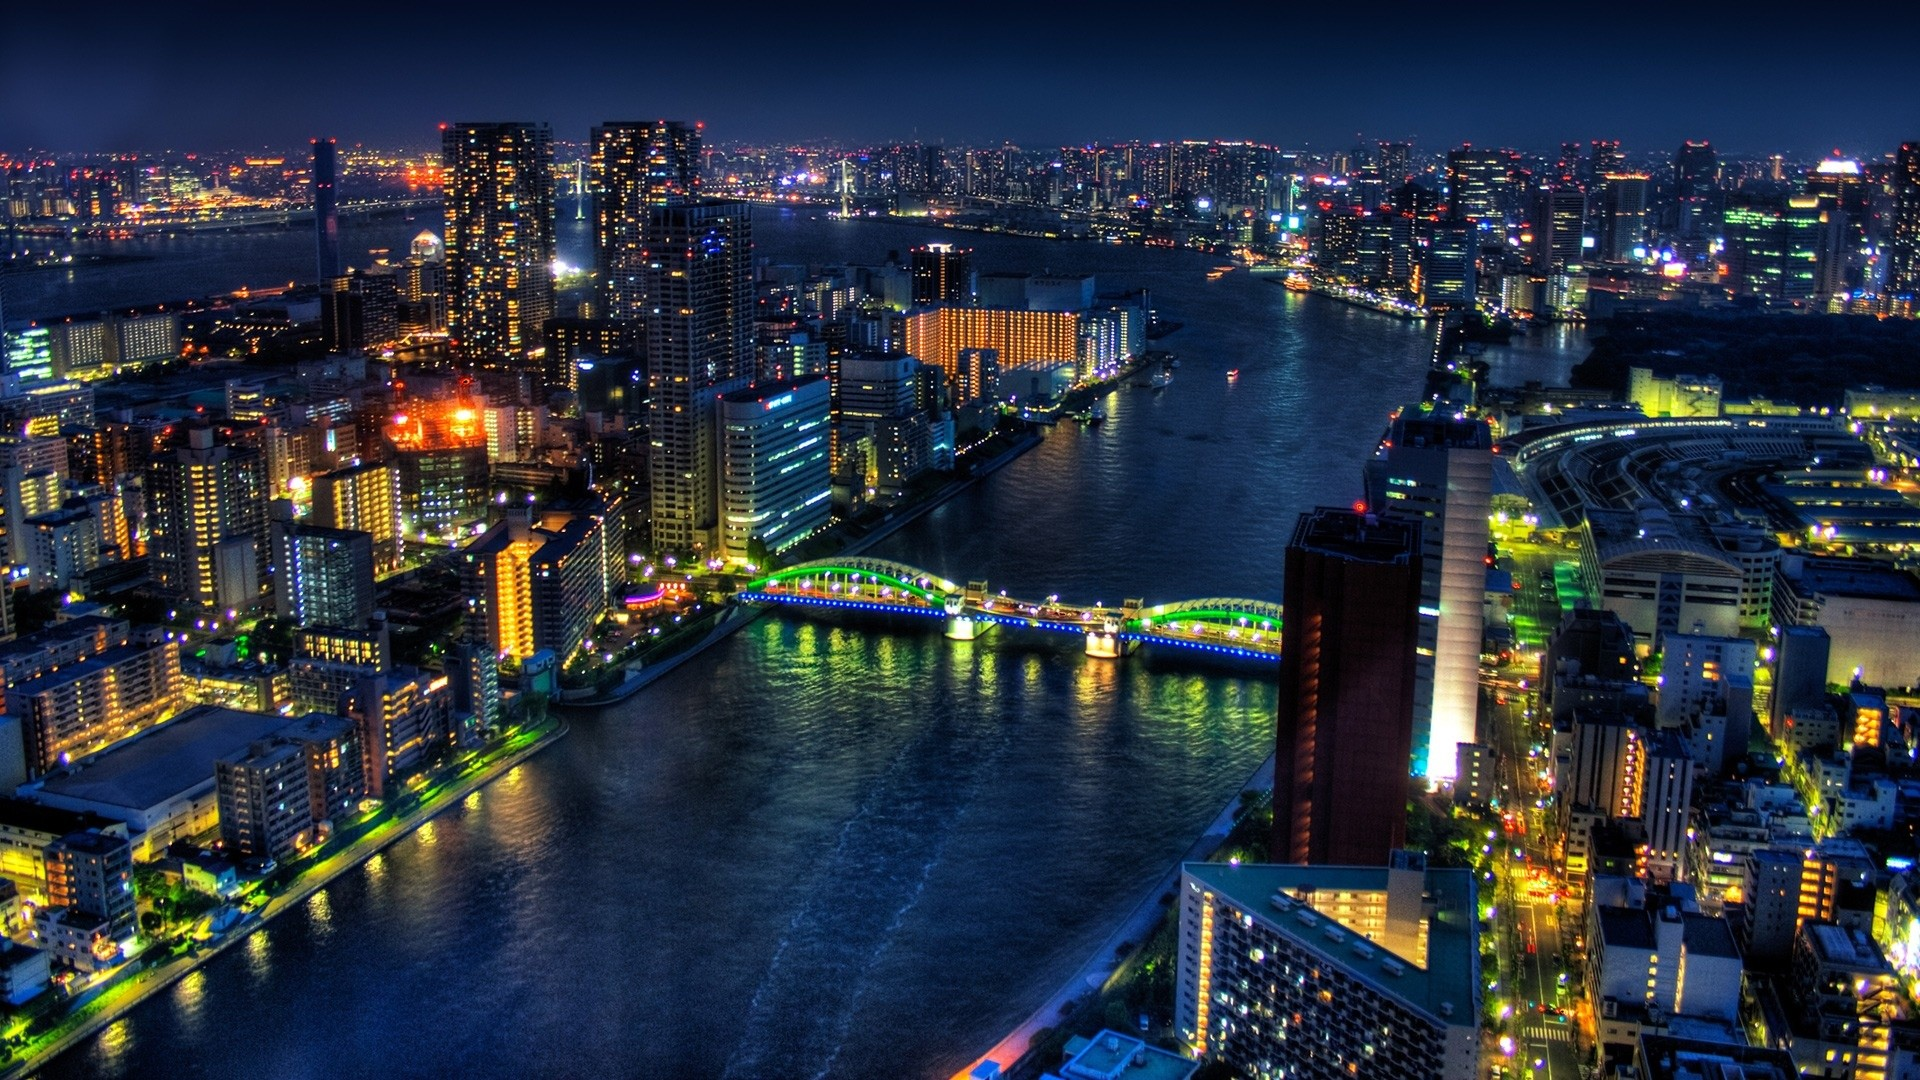 Cities at Night HD | City At Night Hd Desktop Wallpaper